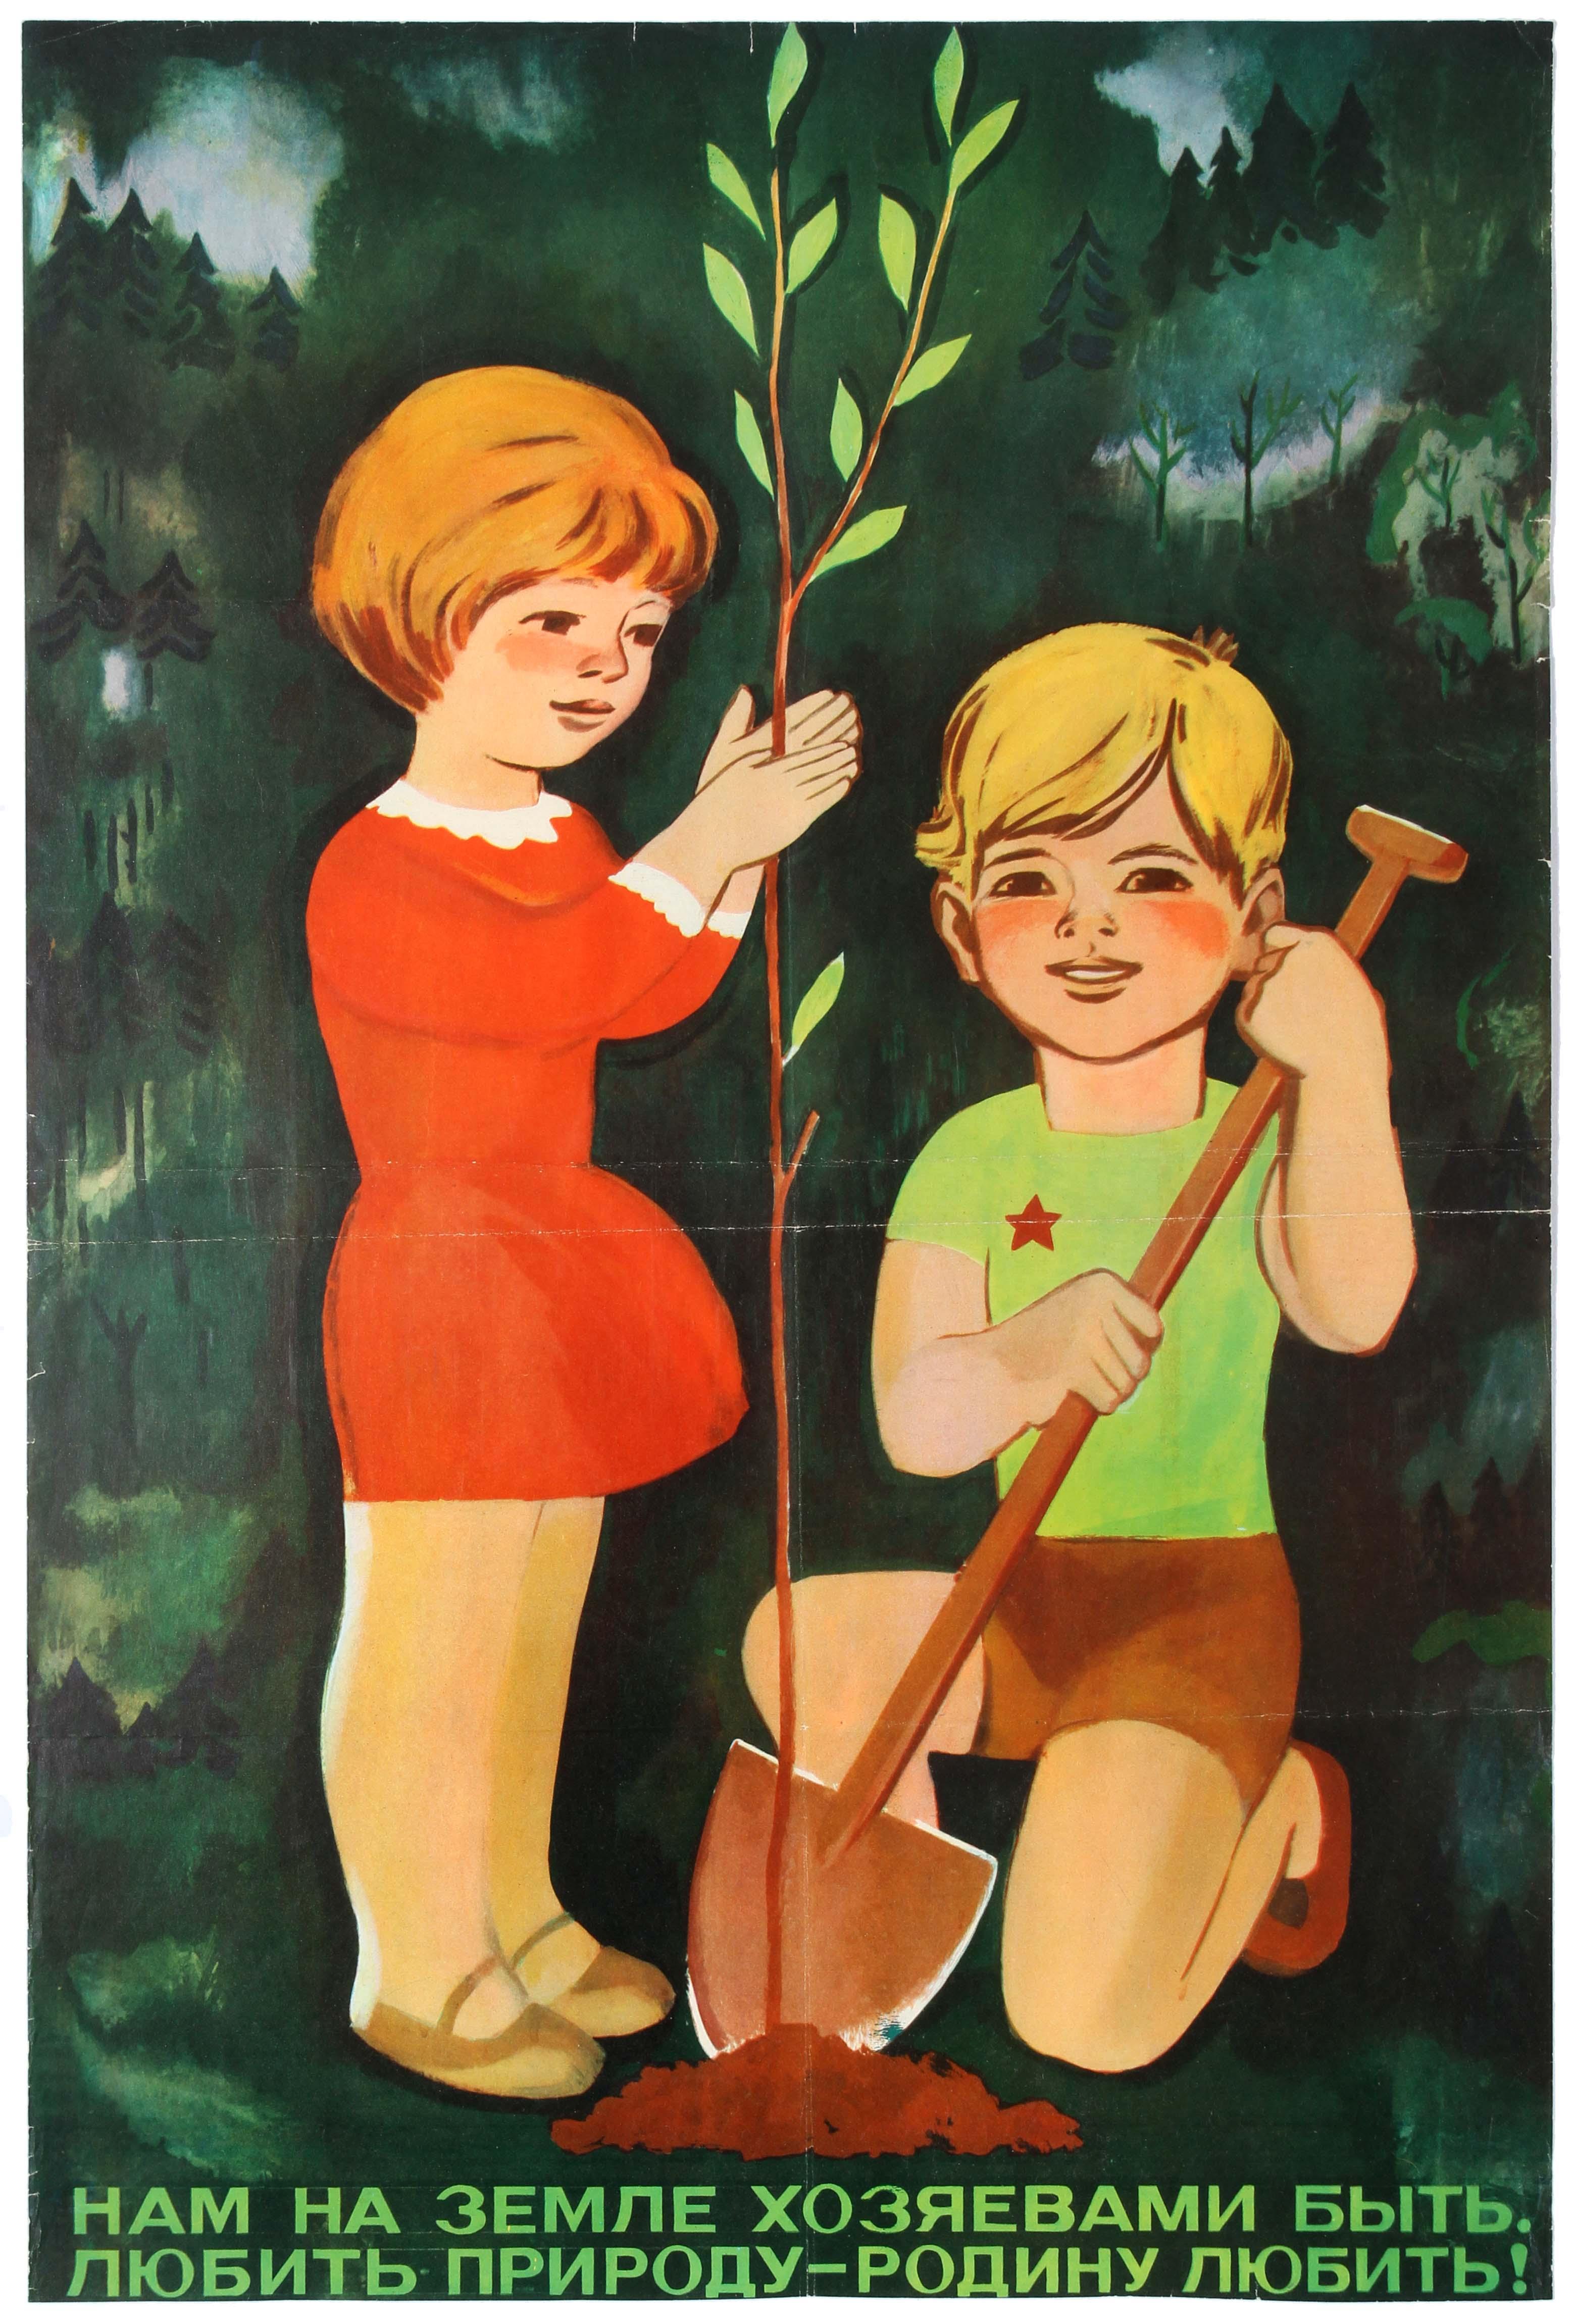 Lot 24 - Set 2 Propaganda Posters USSR Love Nature Soviet Children Coomunist League